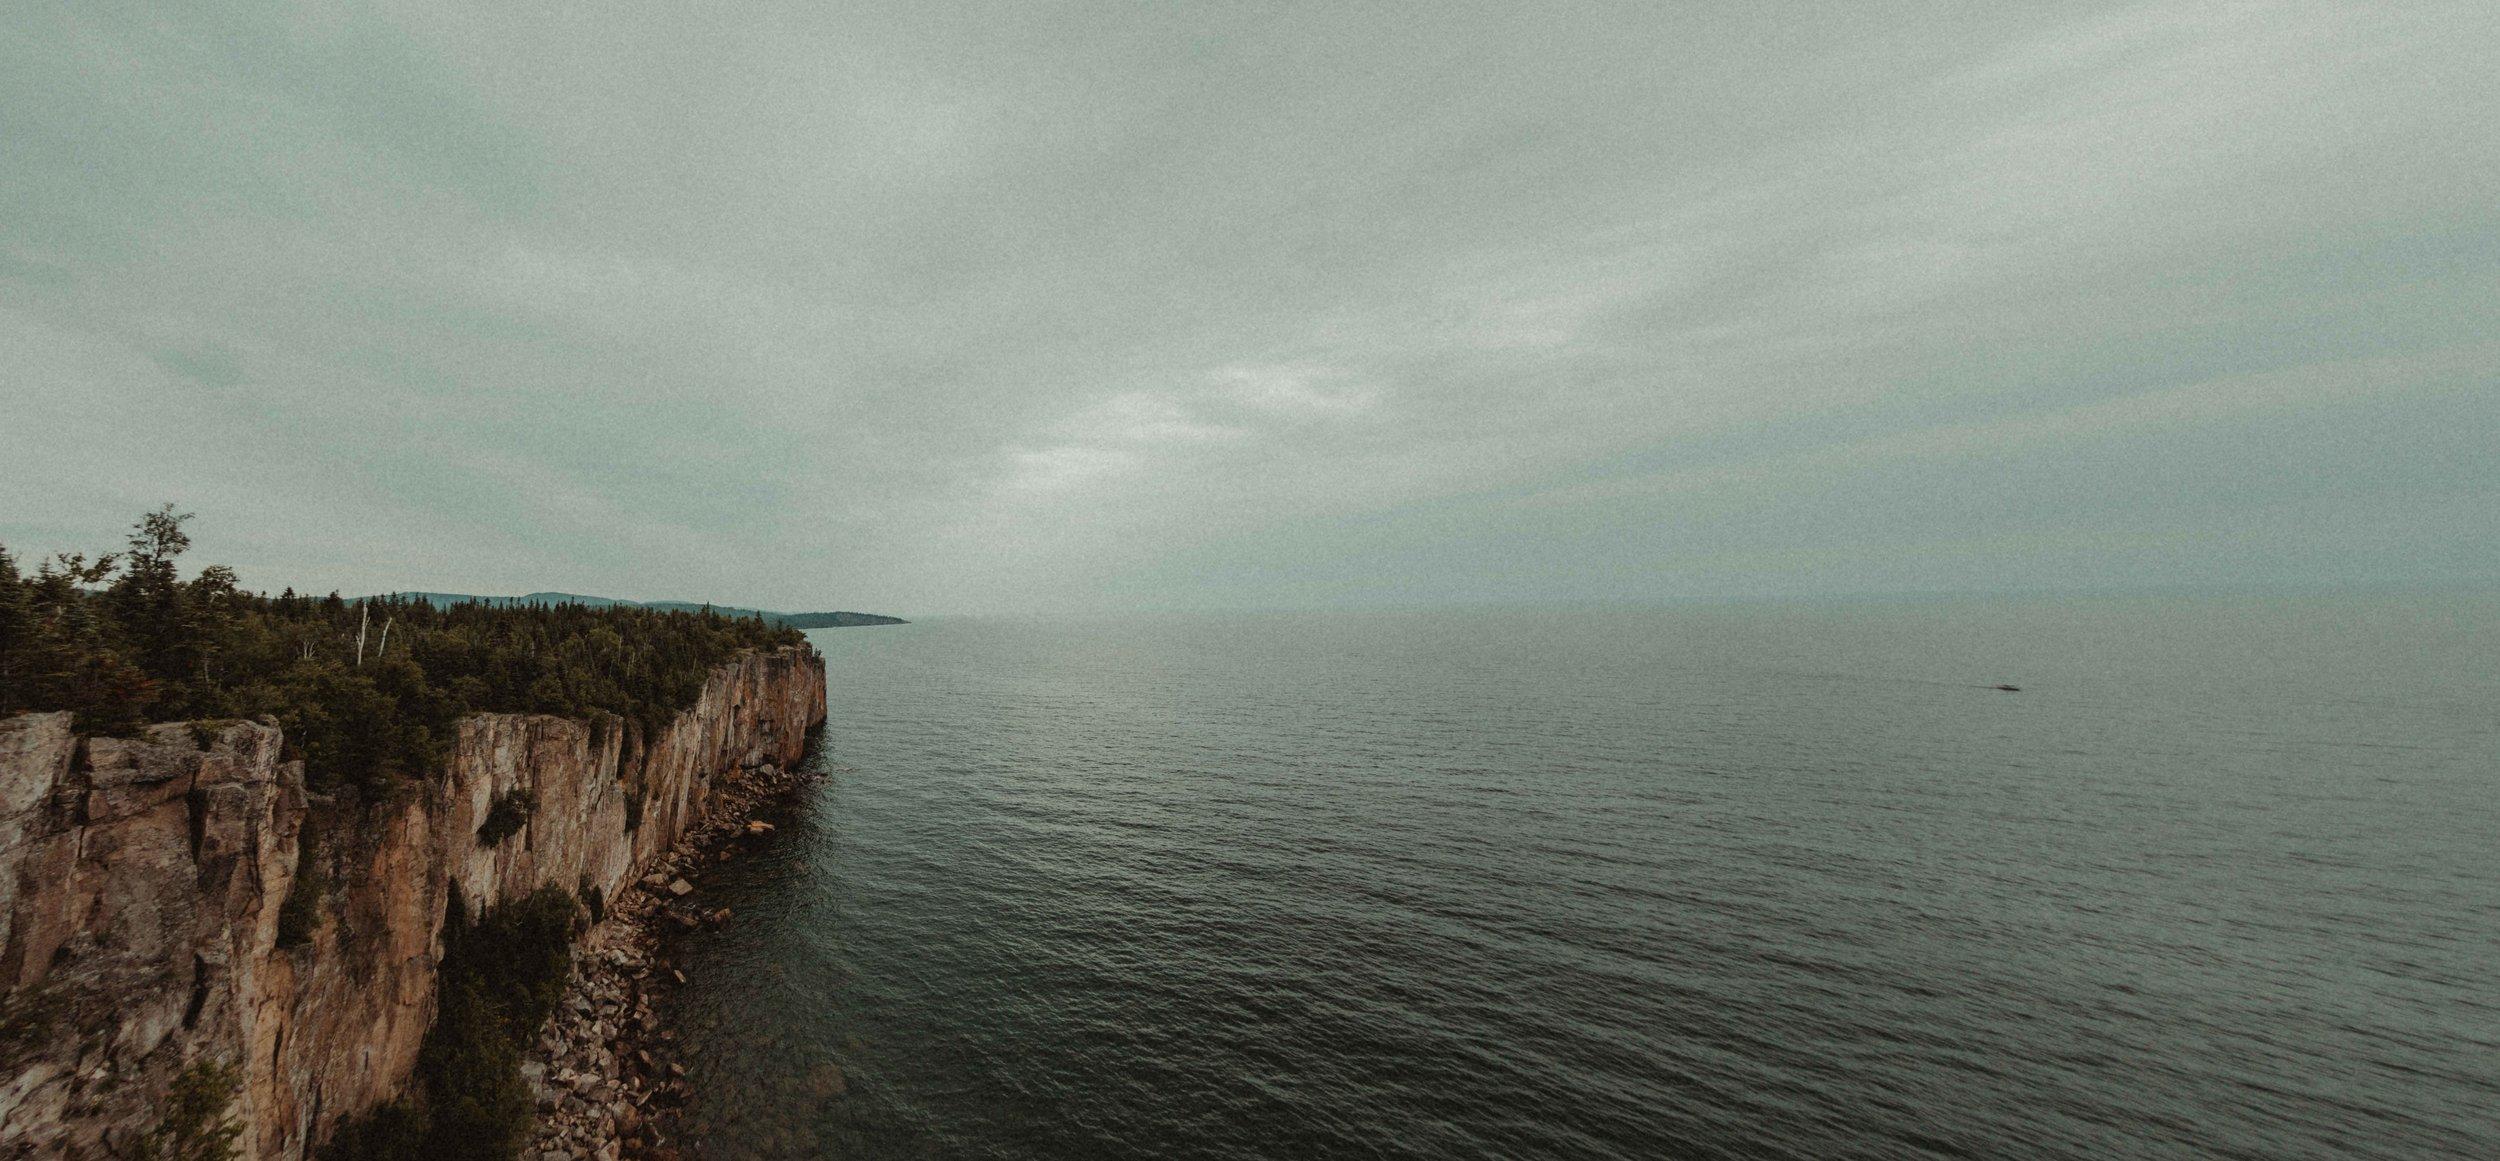 Duluth06.jpg